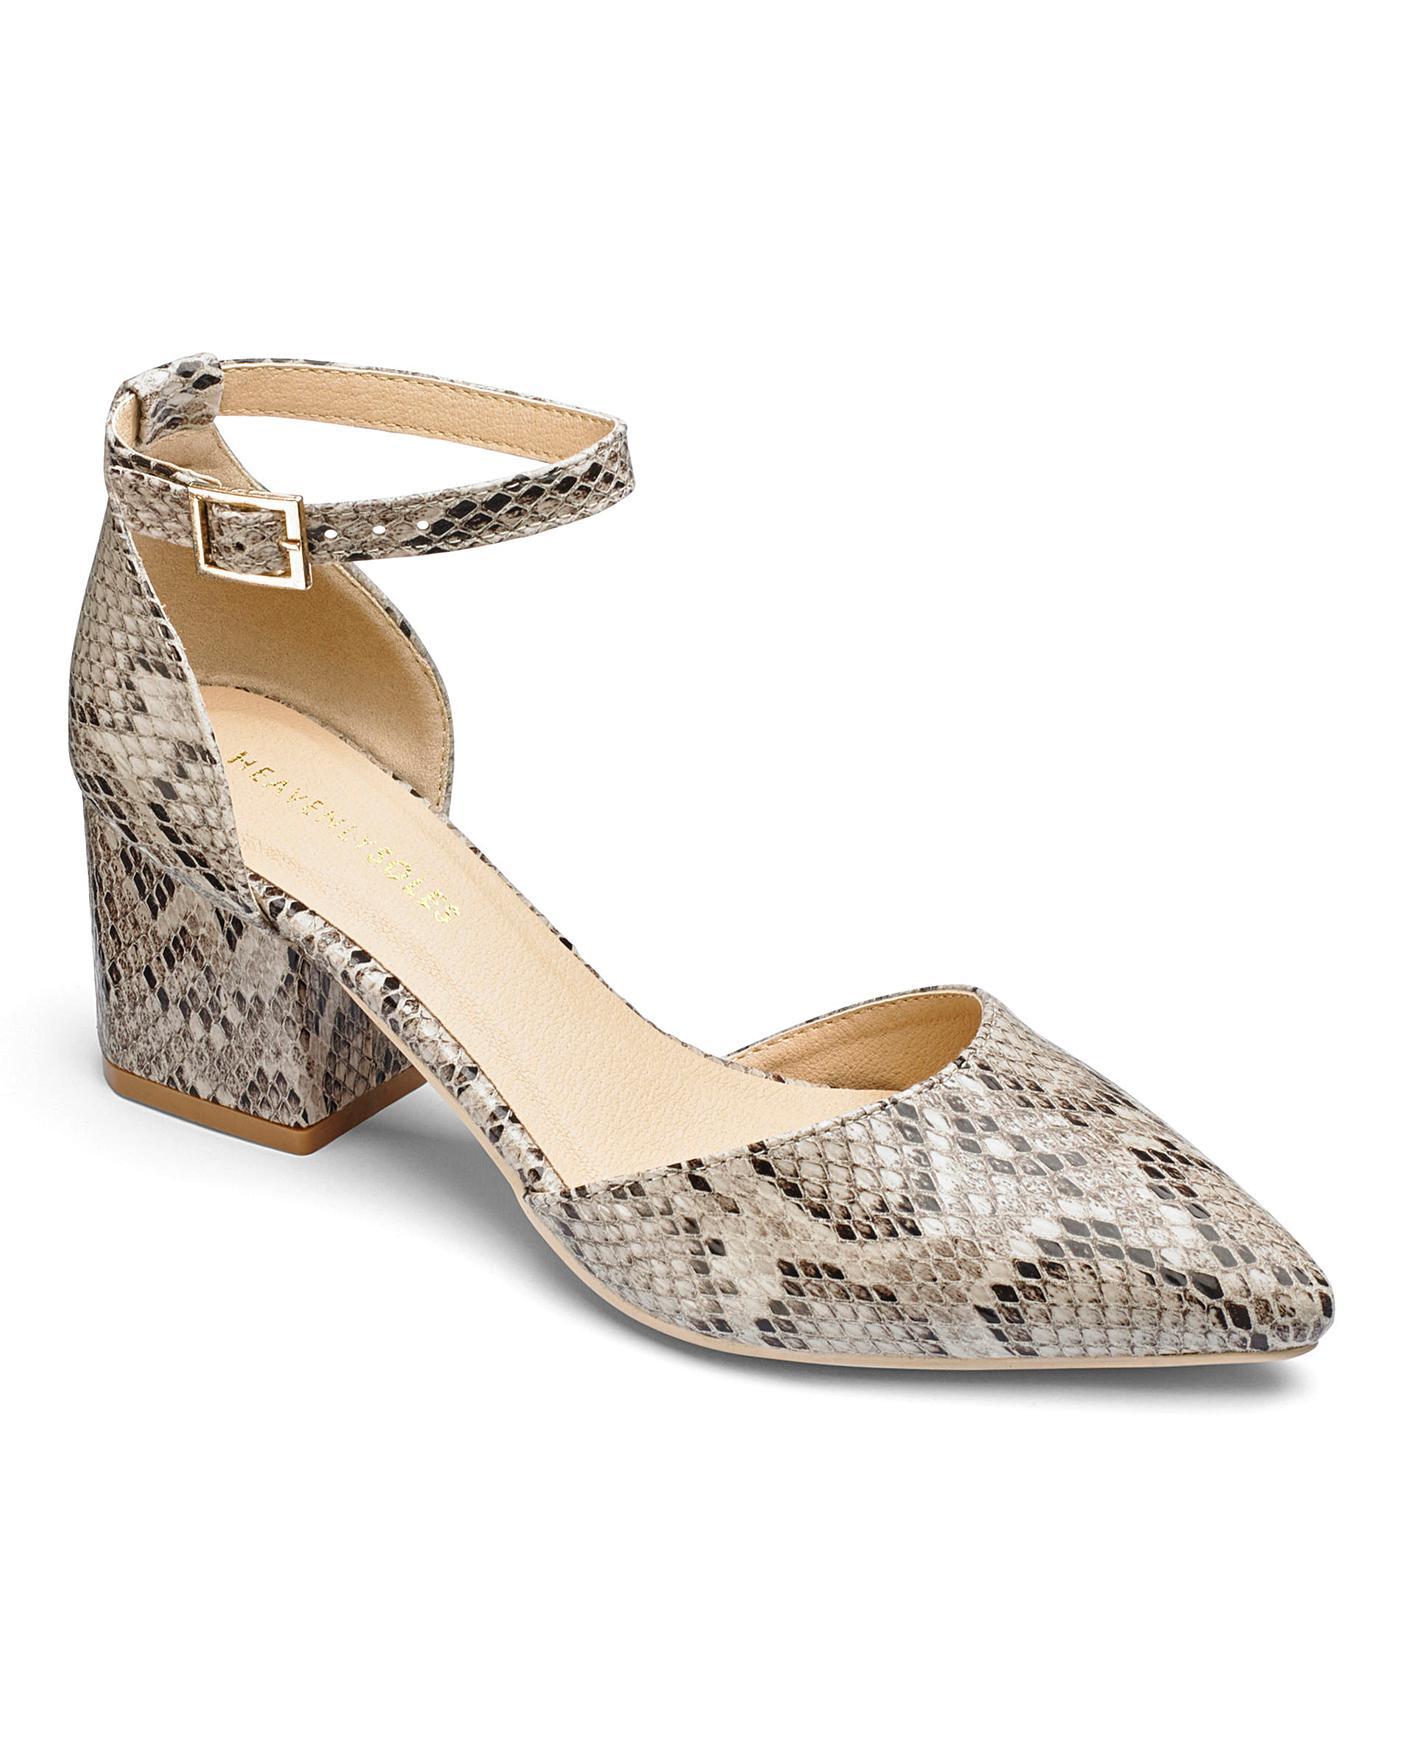 ef15691d598 Heavenly Soles Shoes EEE Fit